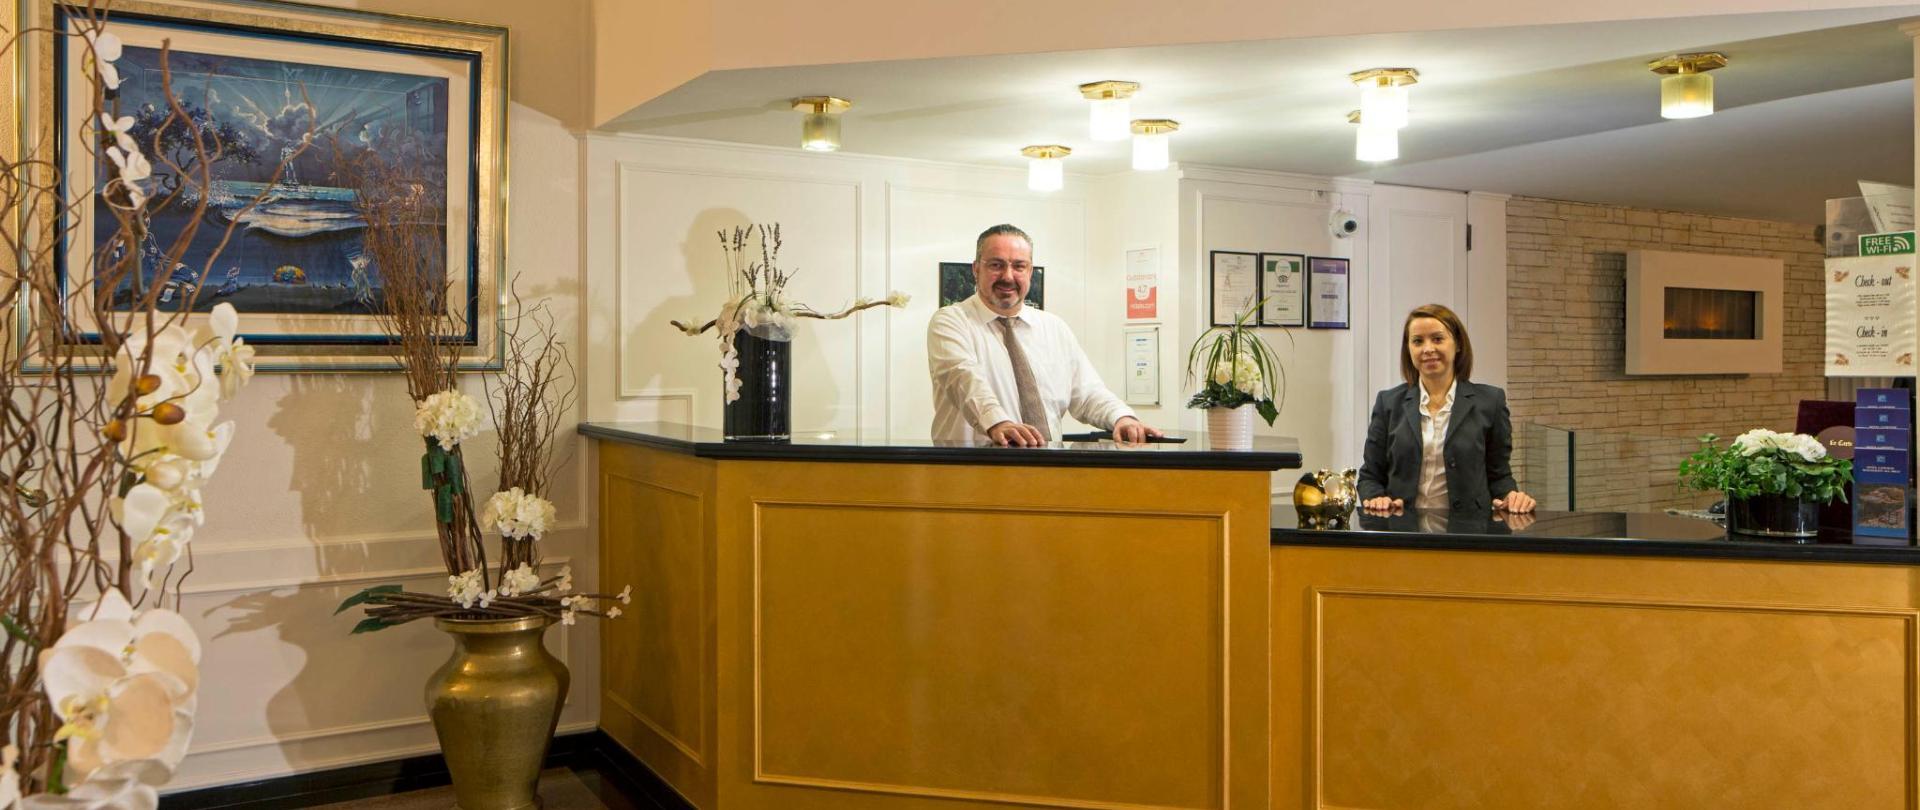 hotel-campione-bissone-reception-rast-marcia.jpg